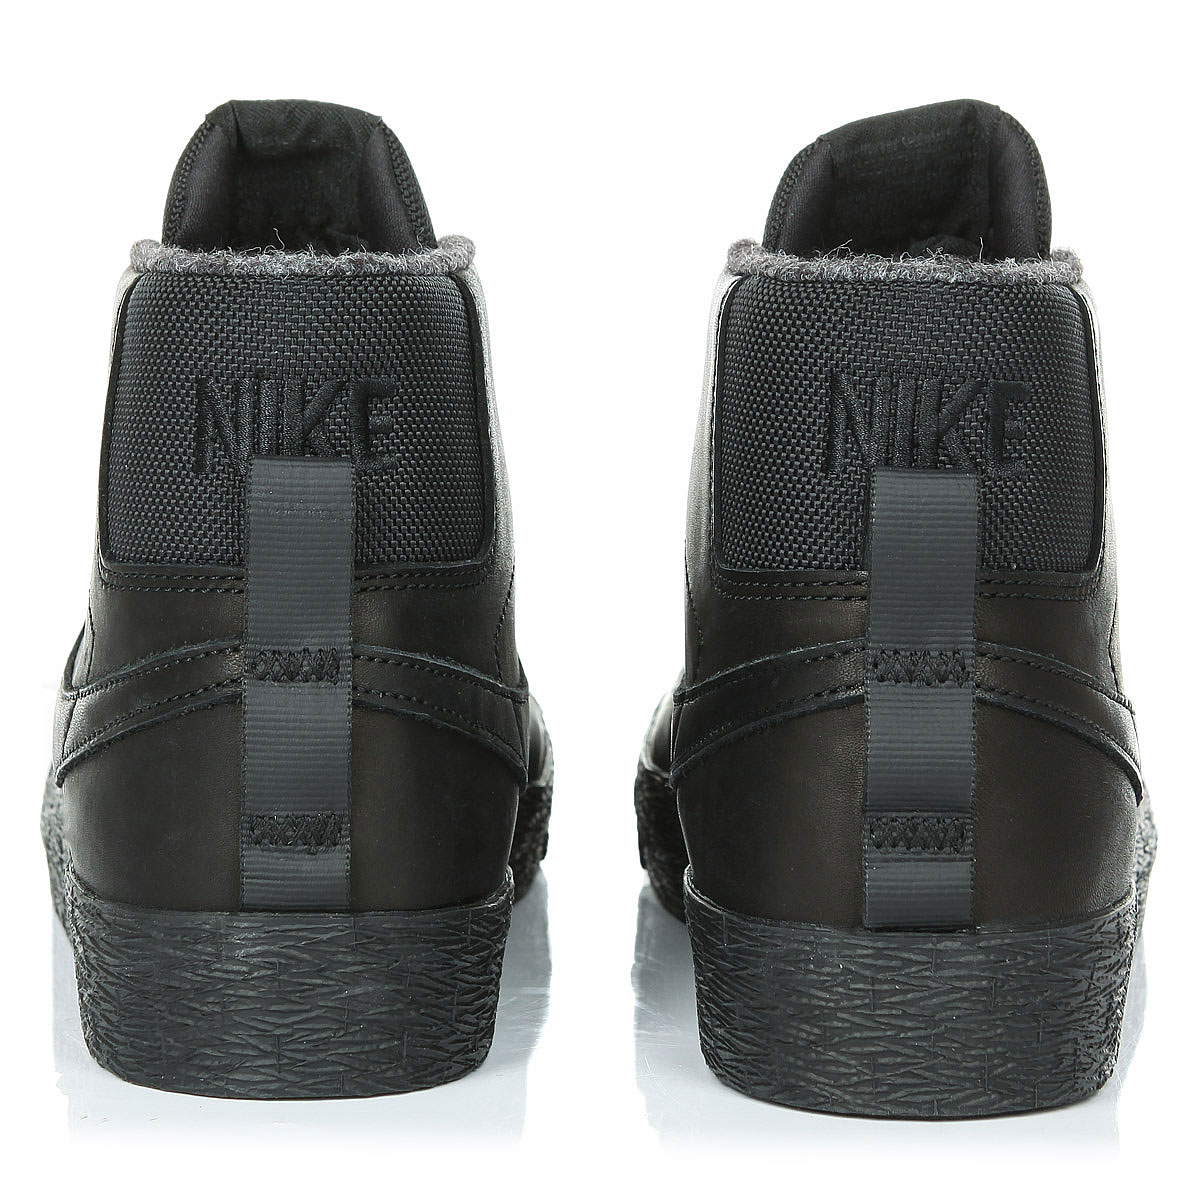 size 40 ab82c be91e Купить ботинки высокие Nike SB Blazer Zoom M Xt Bota Black ...